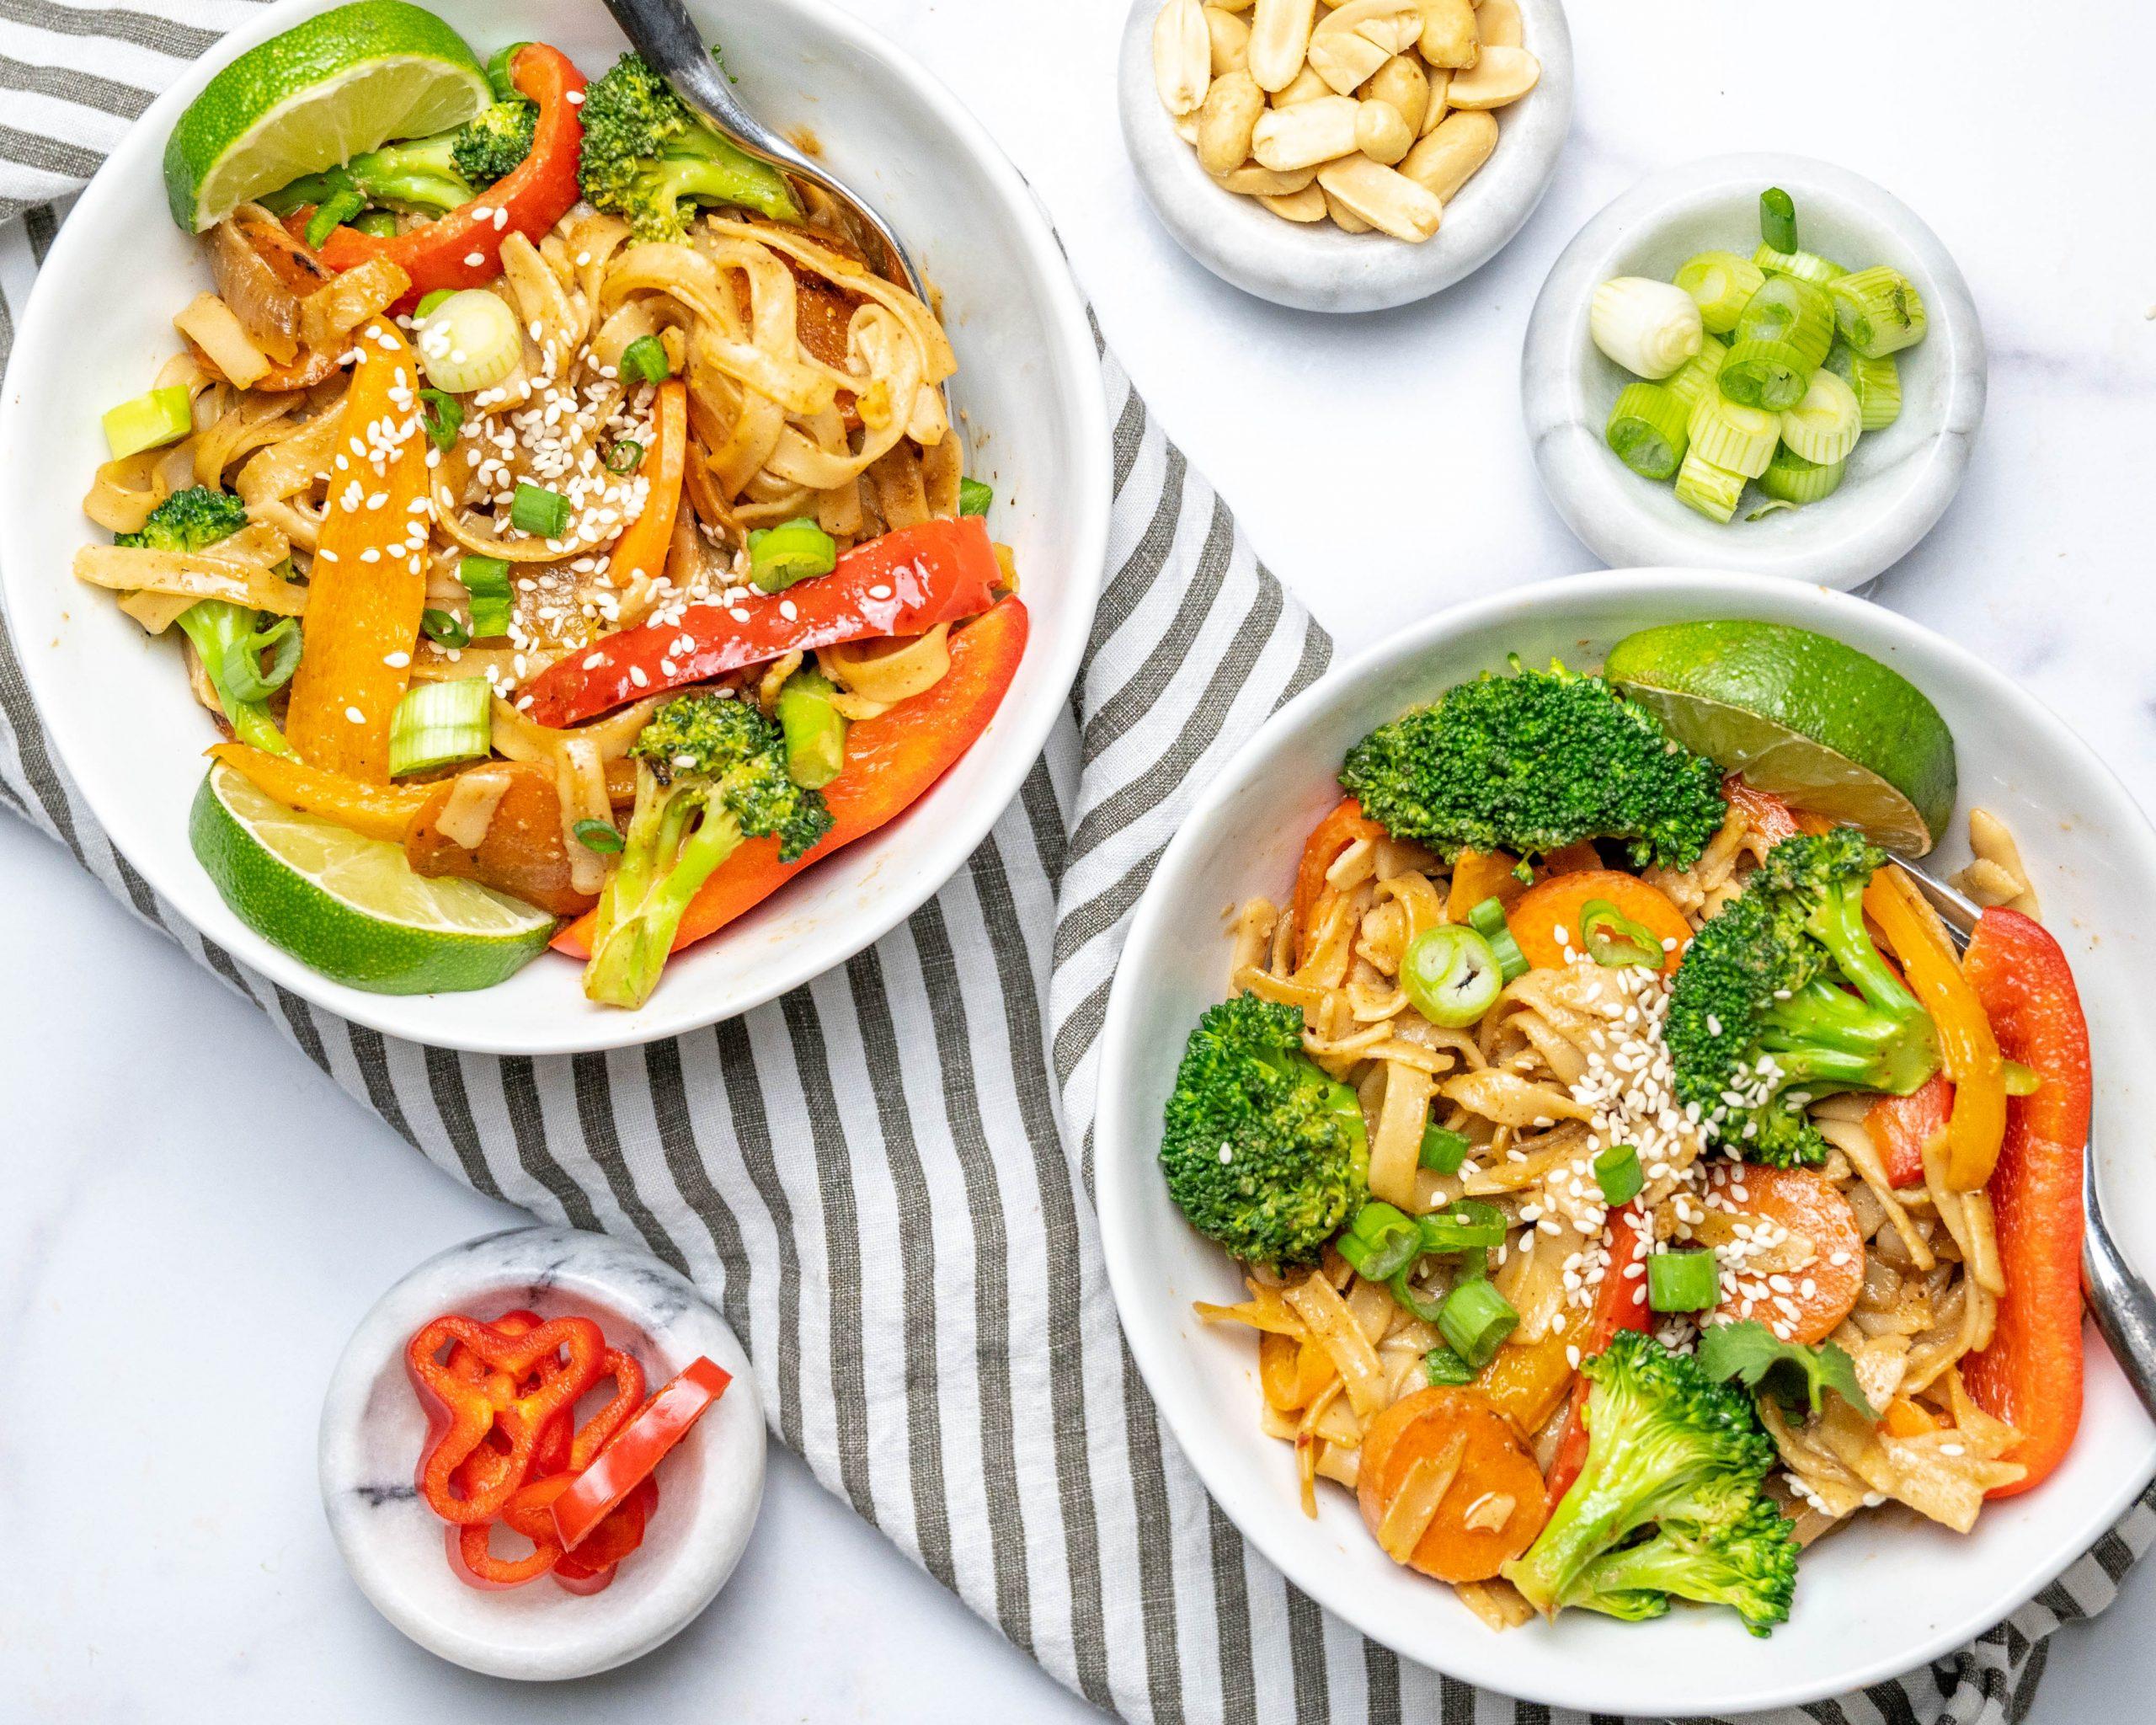 Rainbow Noodle Stir Fry